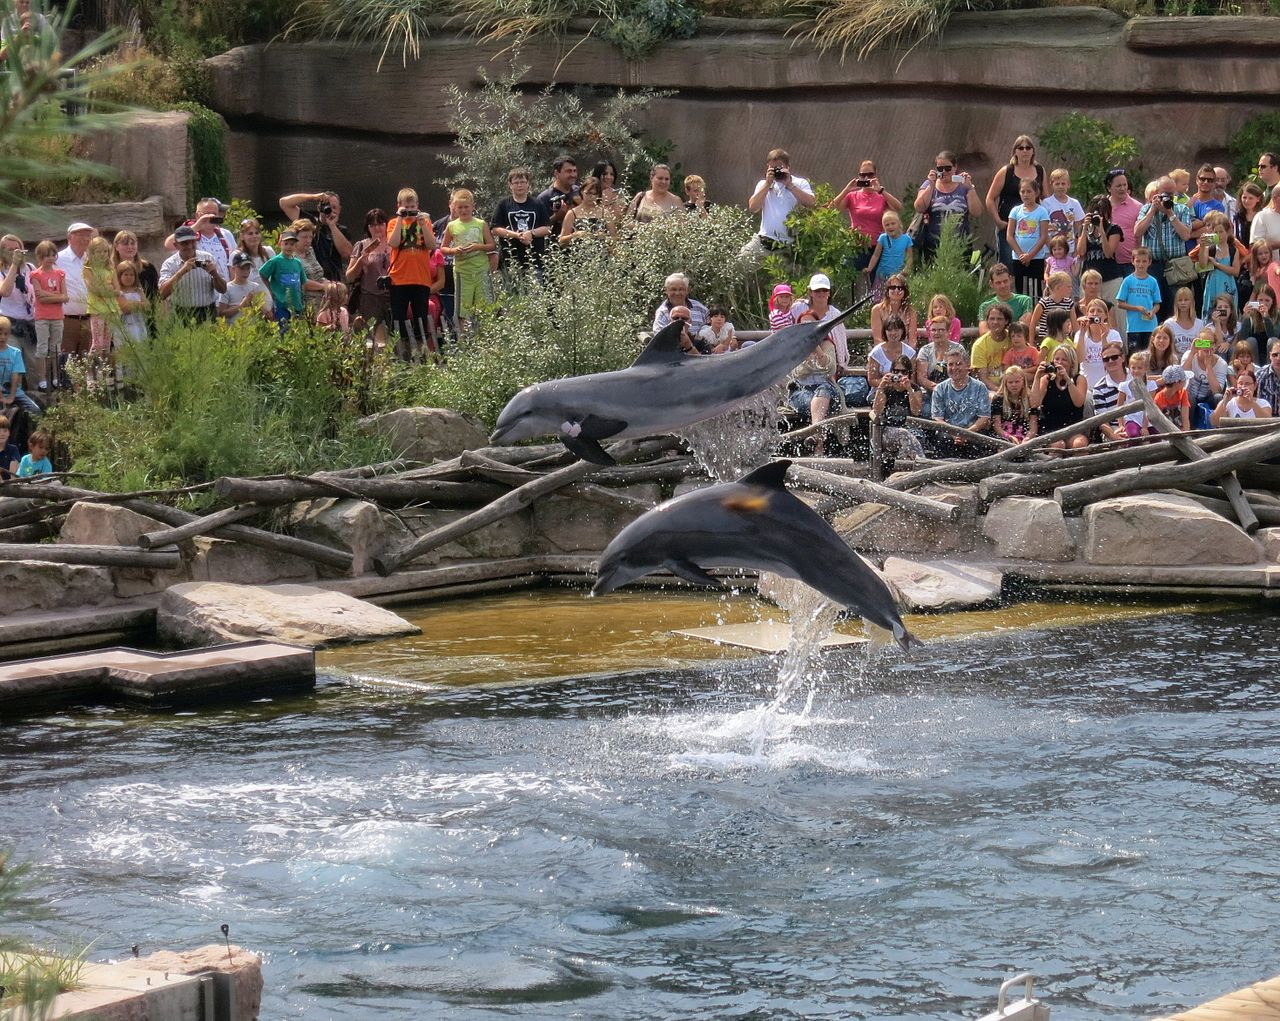 Нюрнбергский зоопарк, дельфинарий